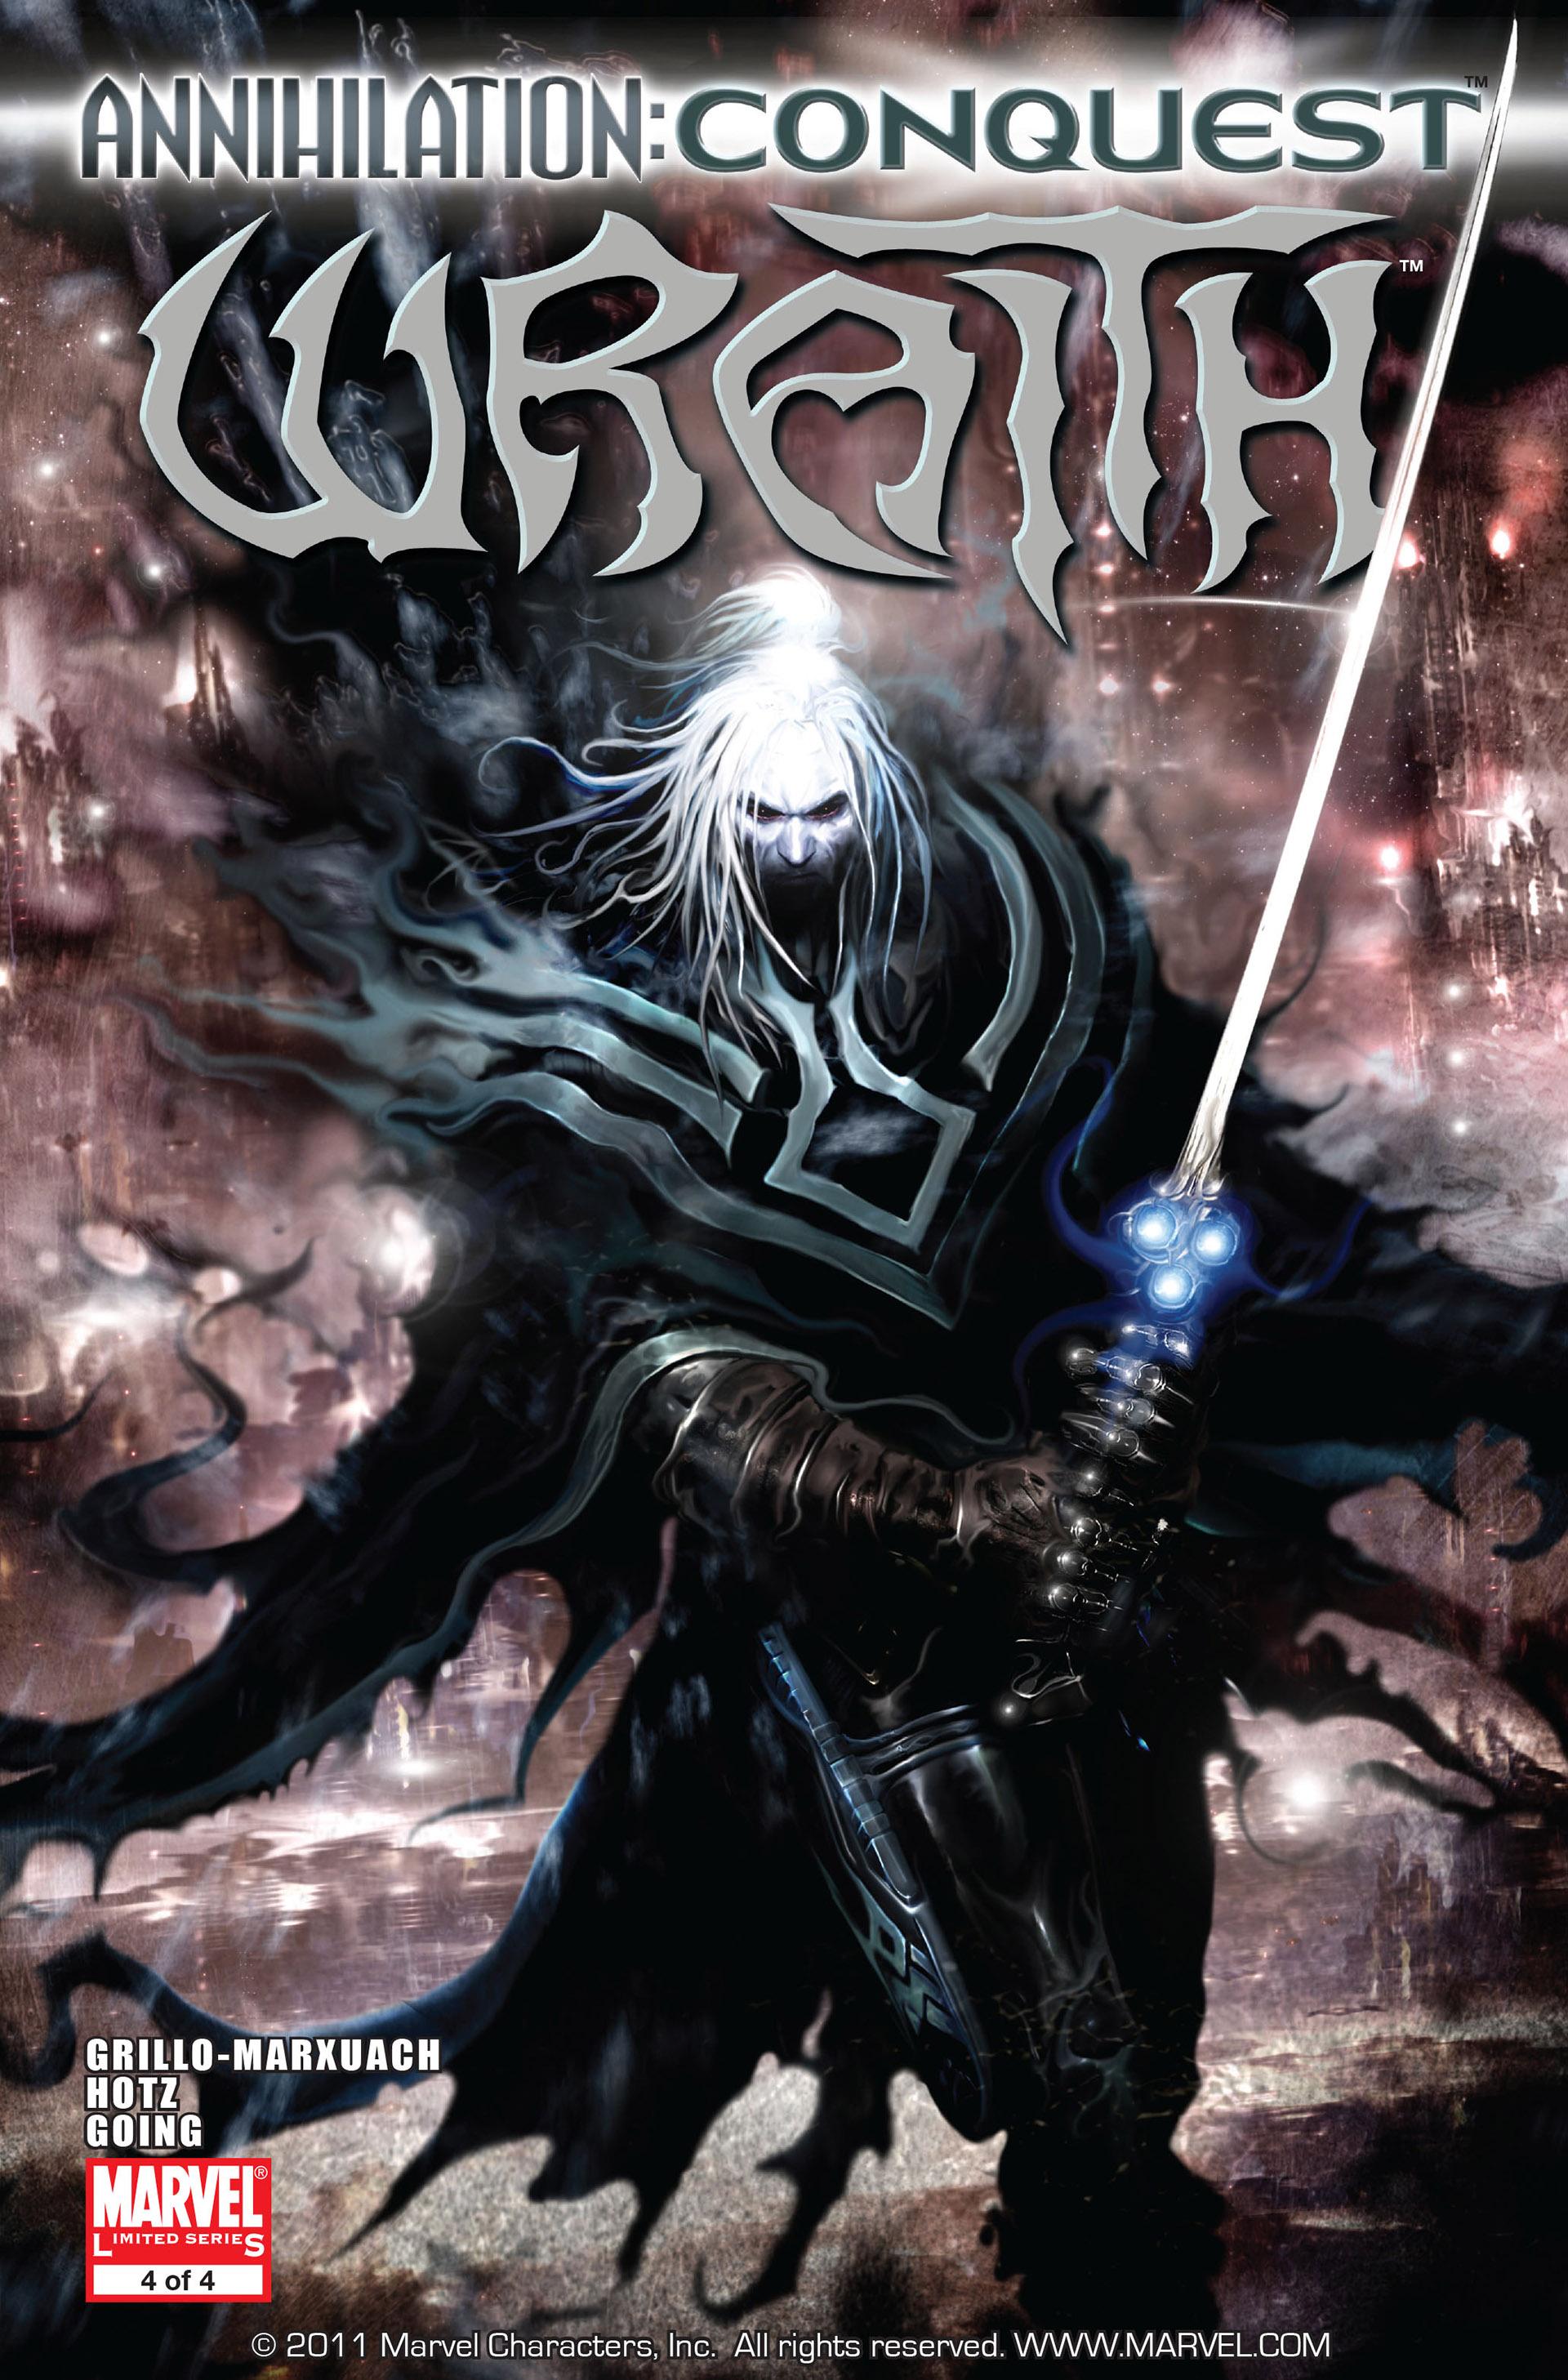 Annihilation: Conquest - Wraith 4 Page 1